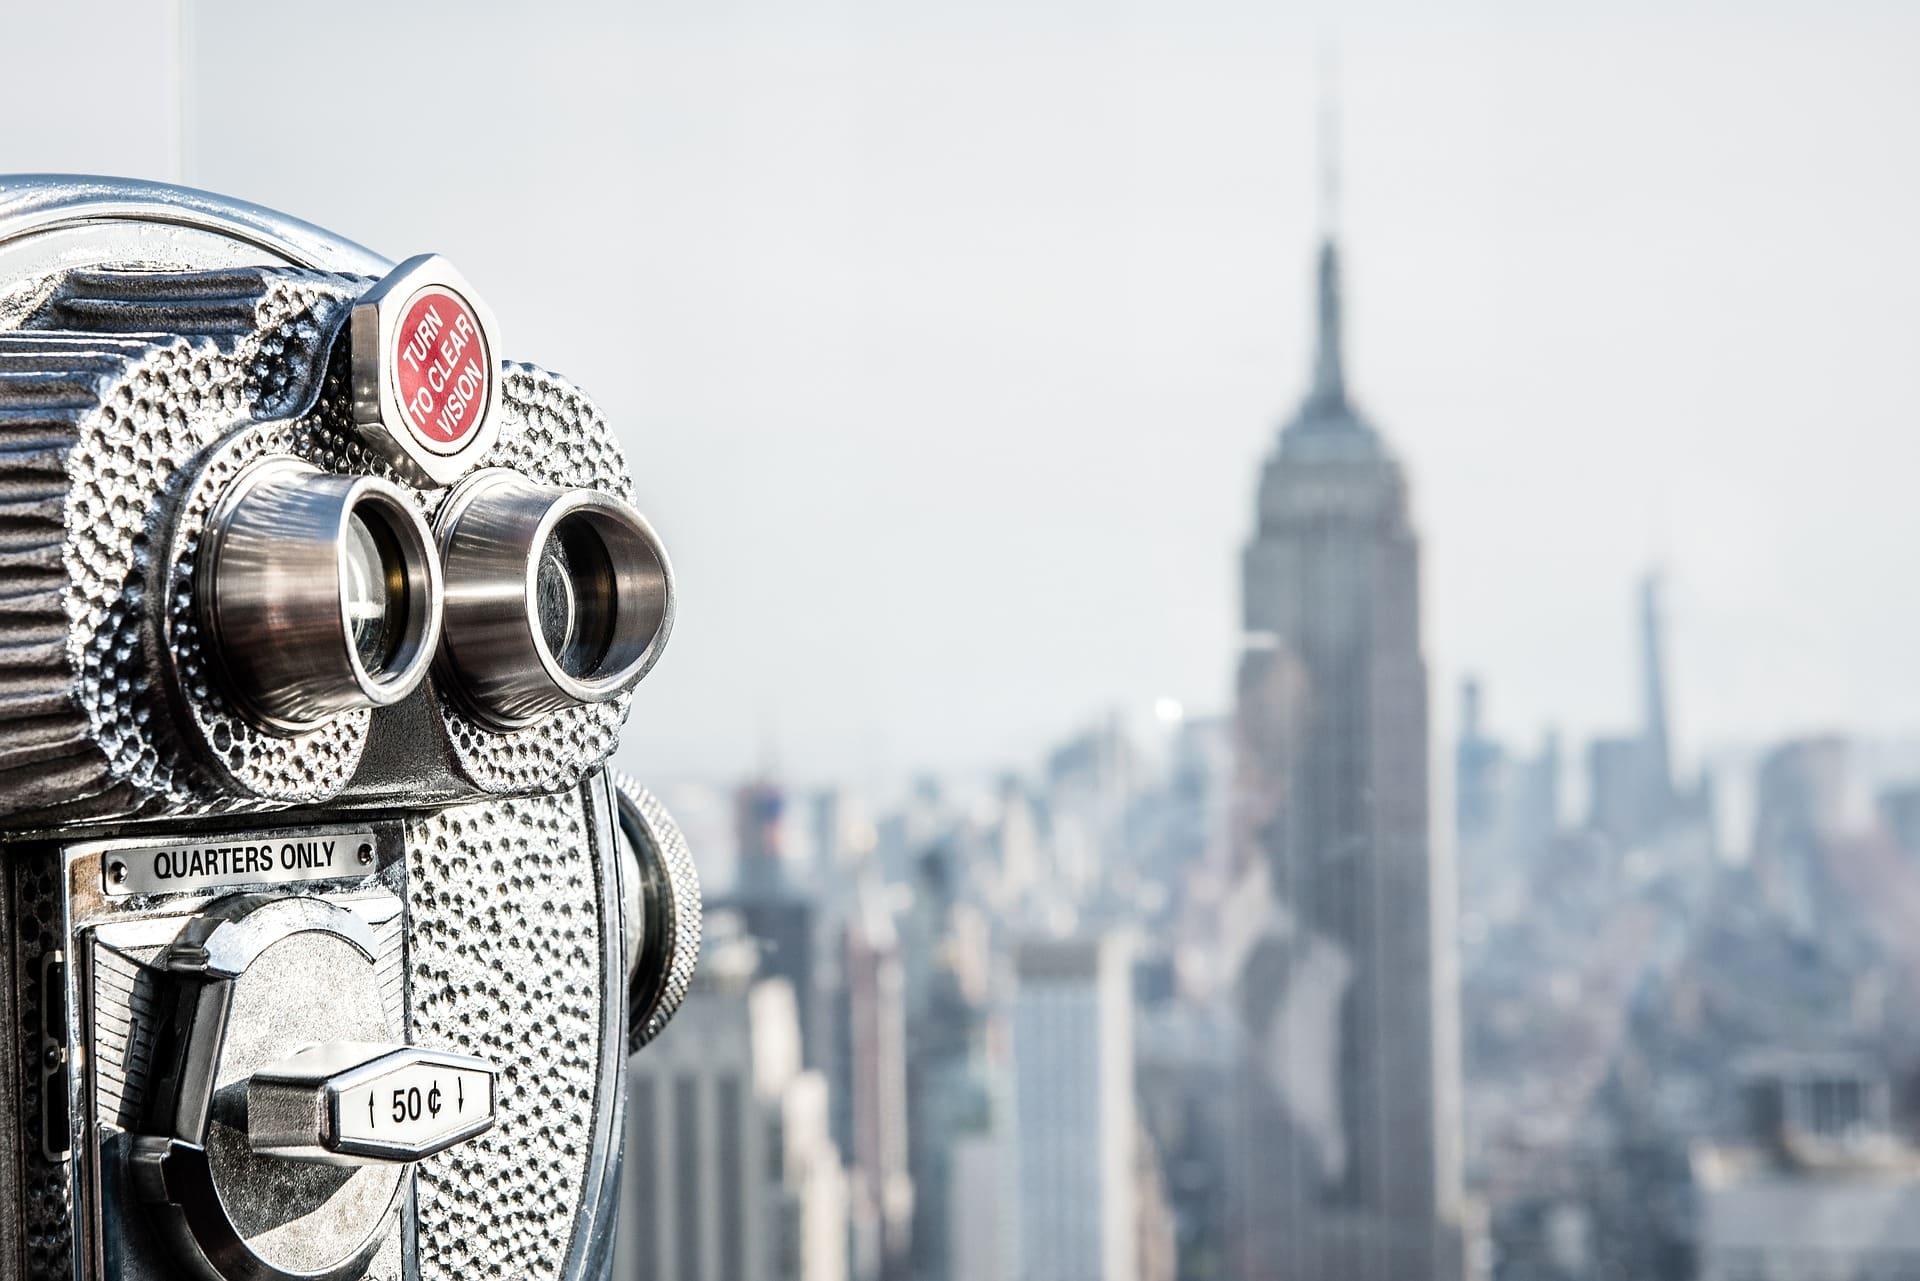 Empire State Building, Empire State Building